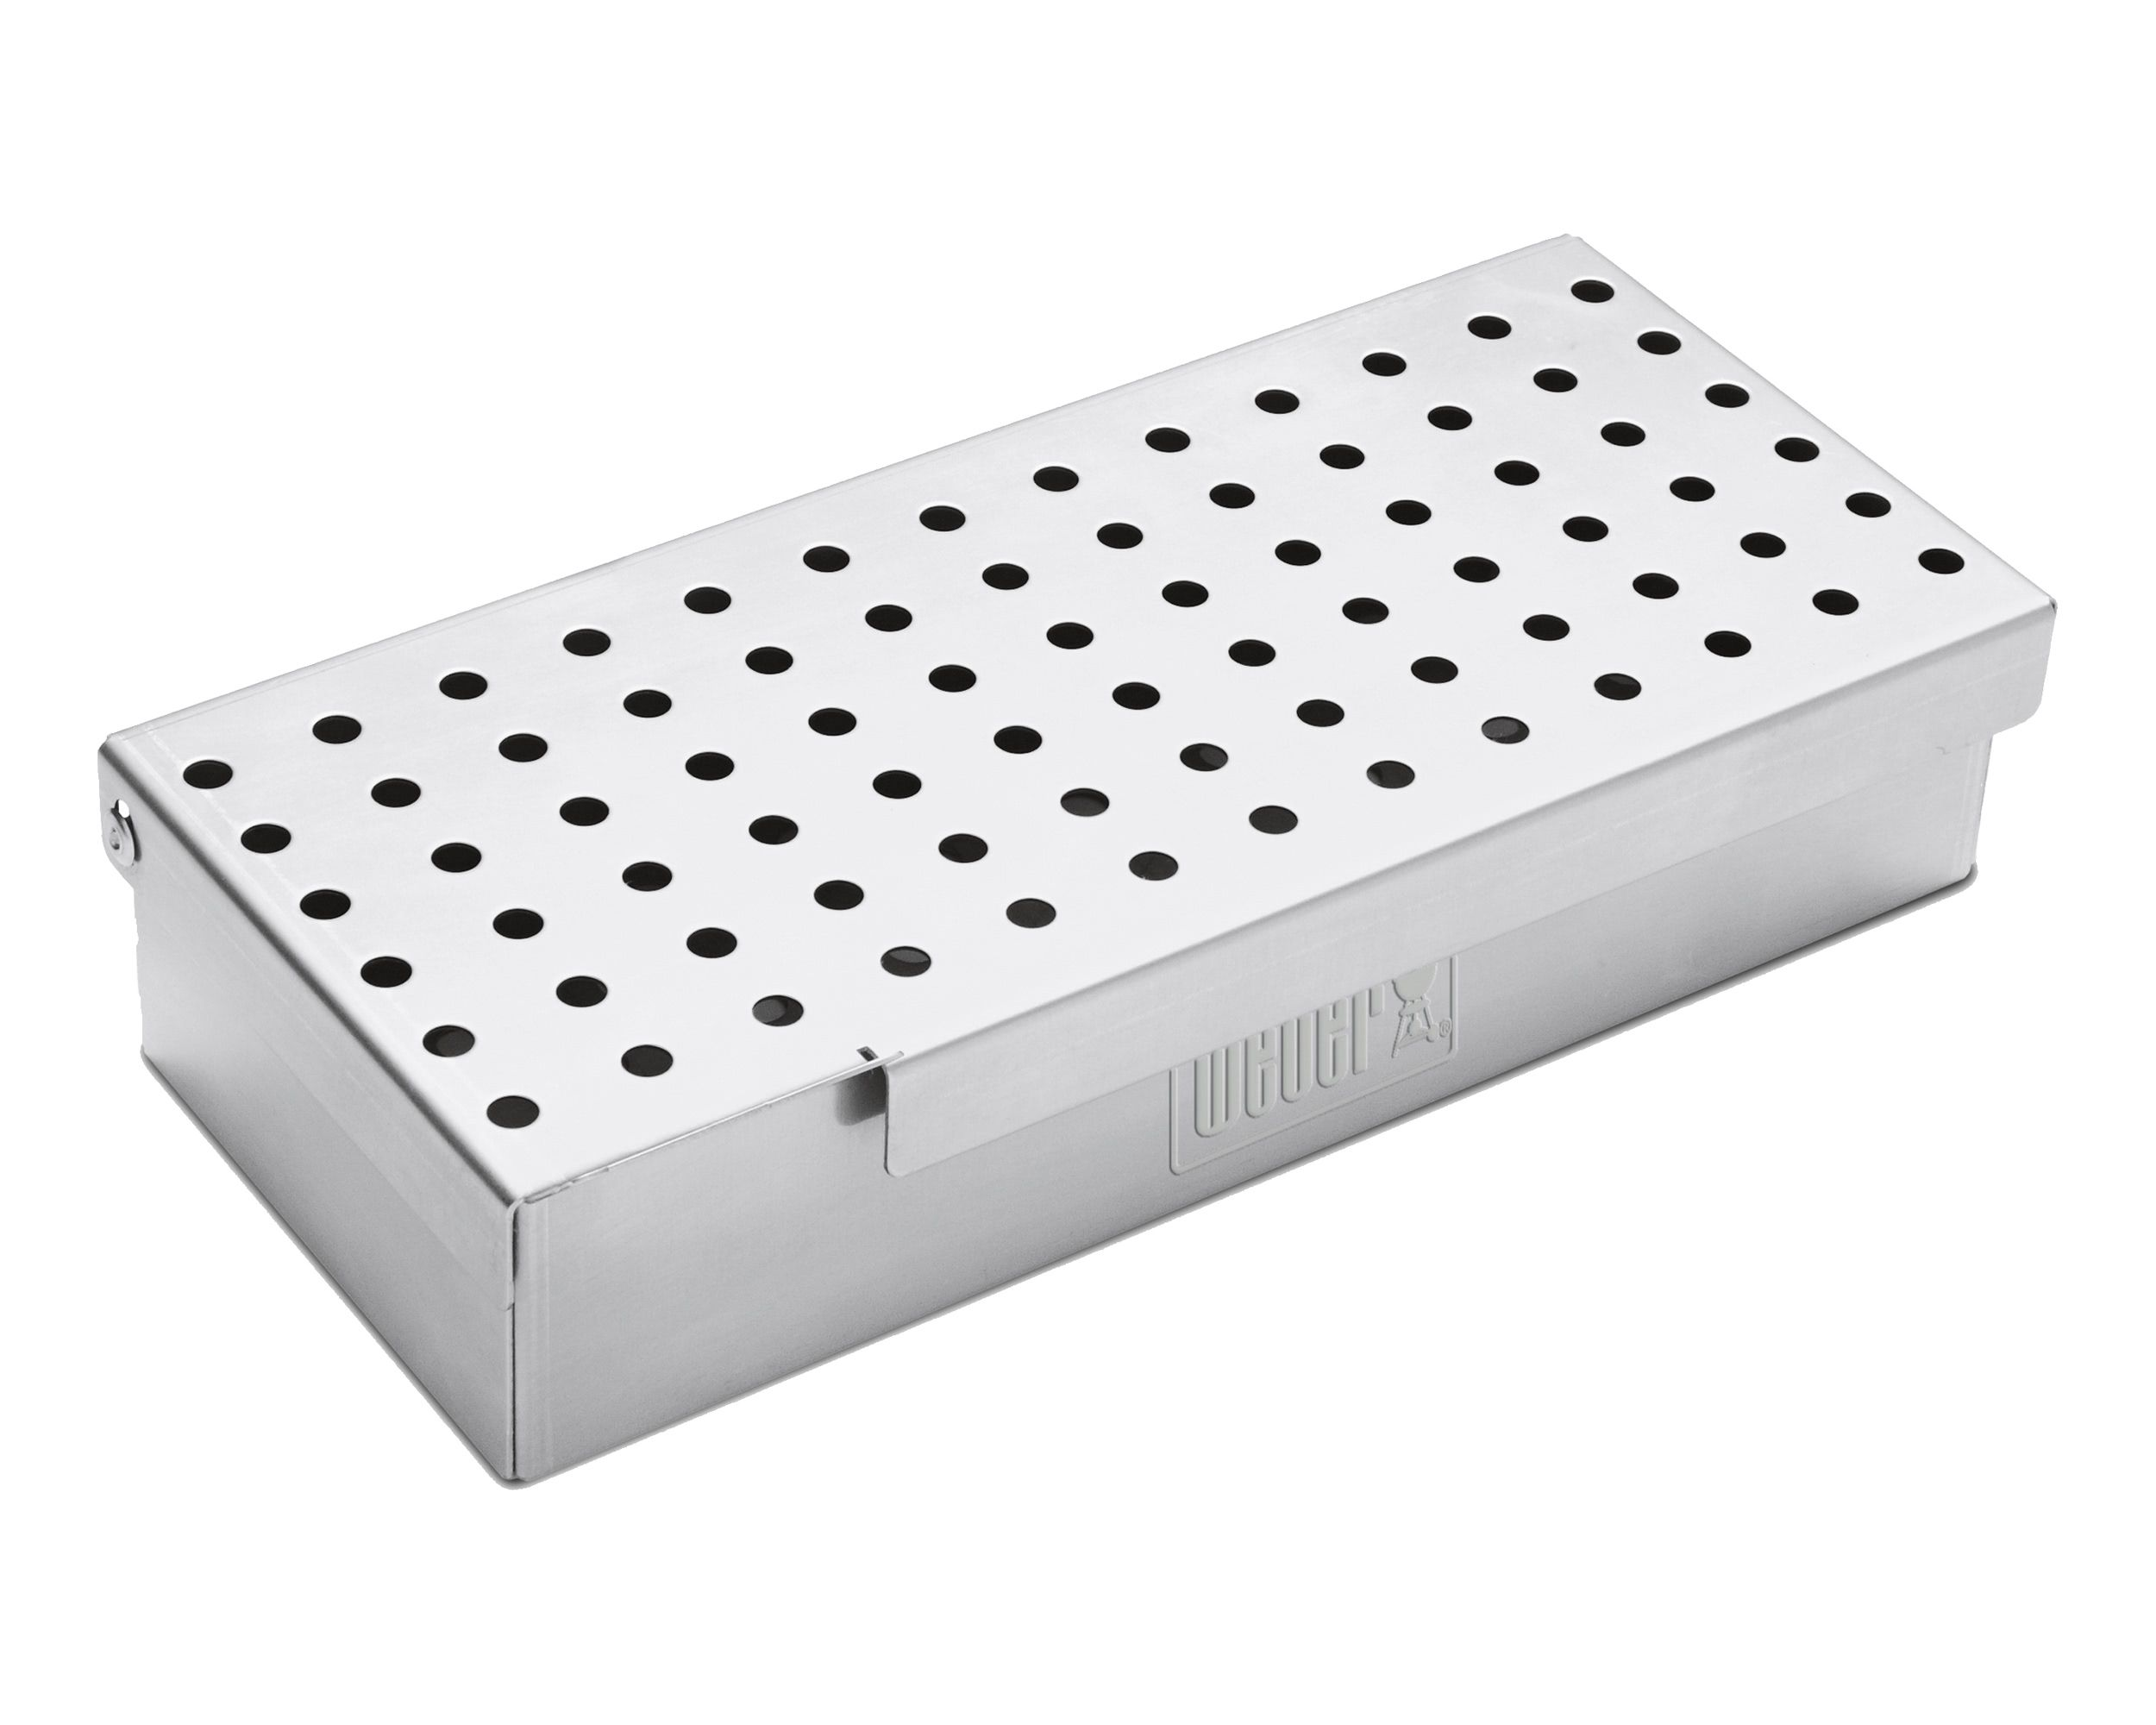 Räucher Box Universal